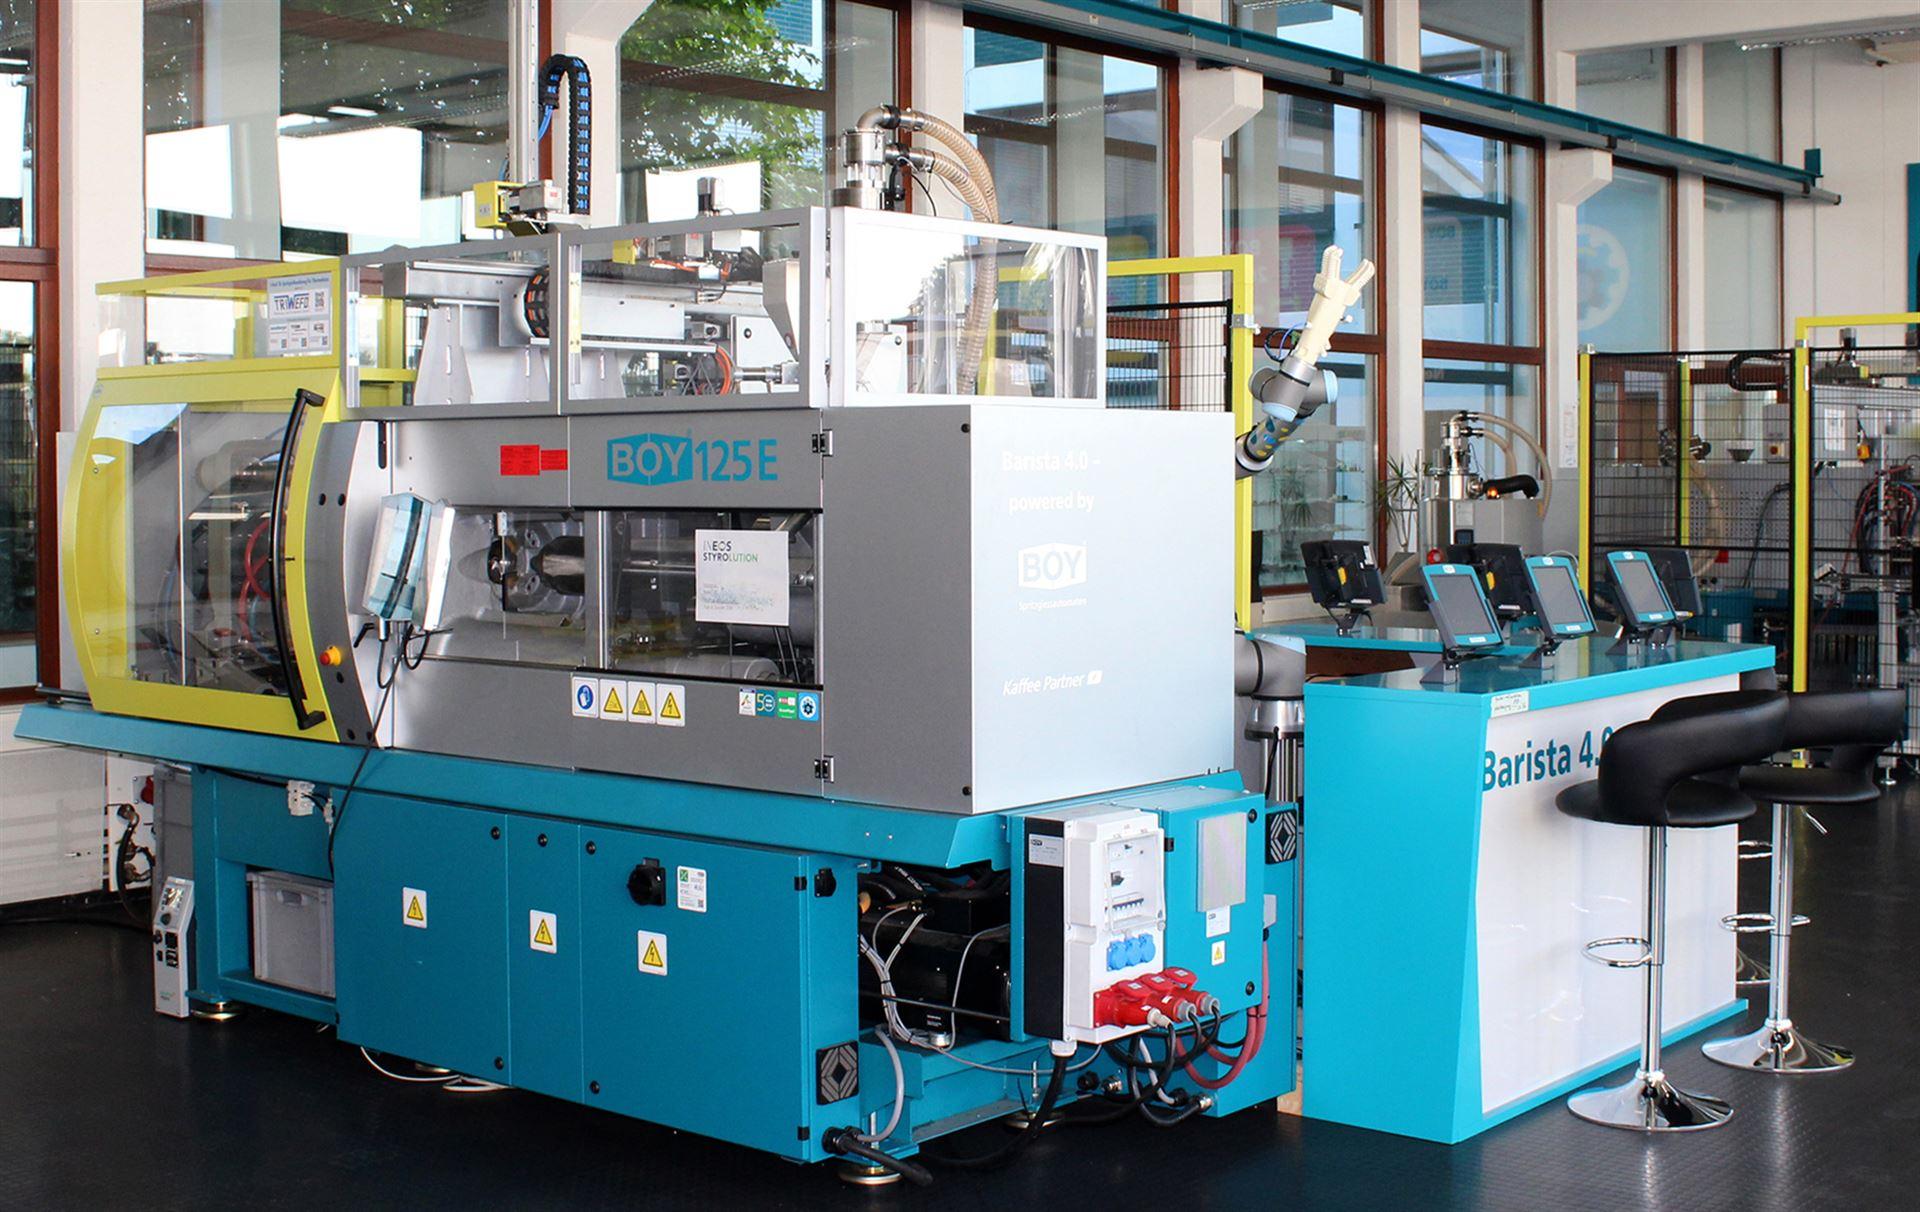 BOY 125 E - Complex production line Barista 4.0